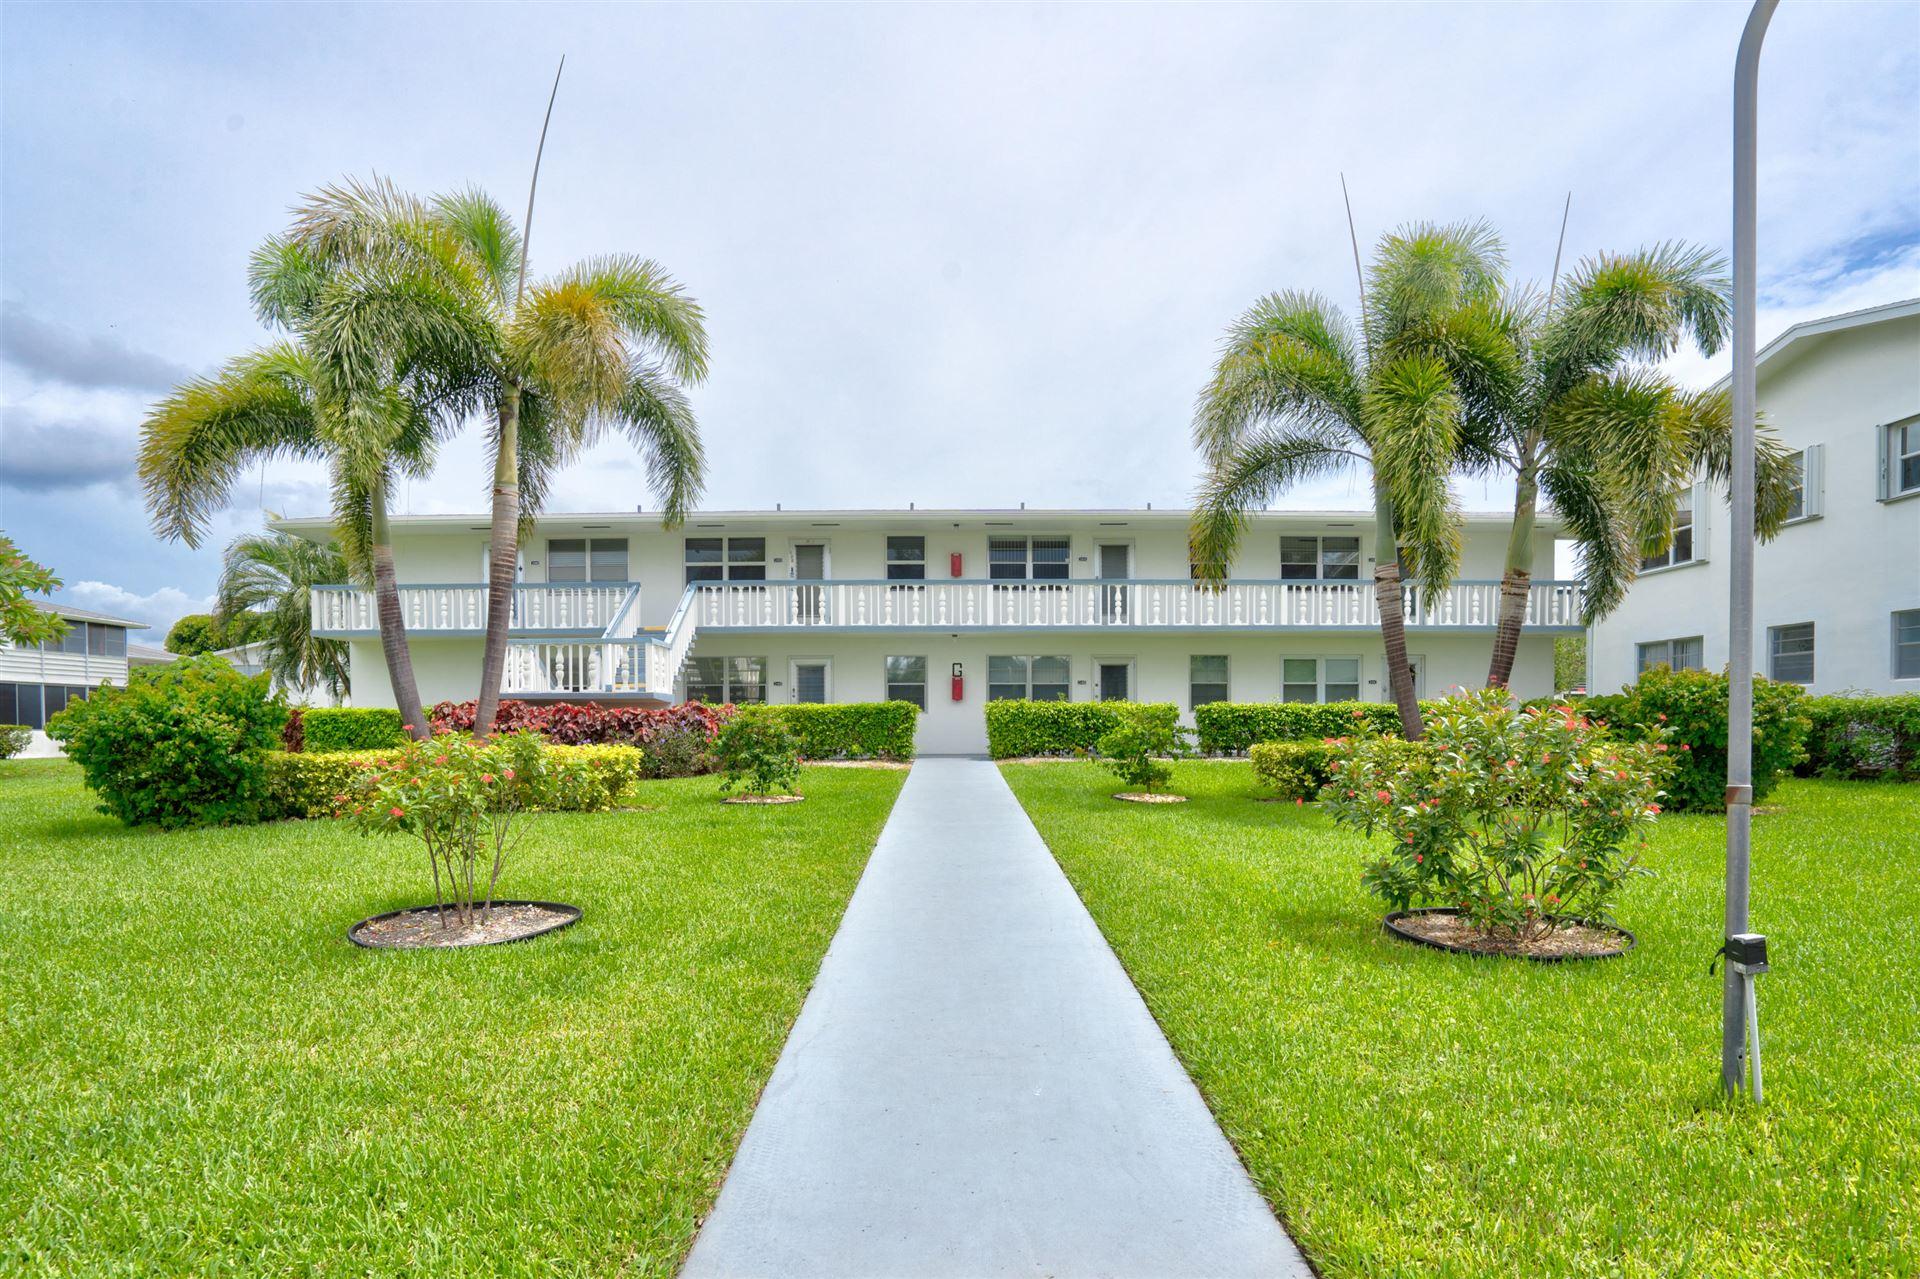 148 Windsor G, West Palm Beach, FL 33417 - MLS#: RX-10729799